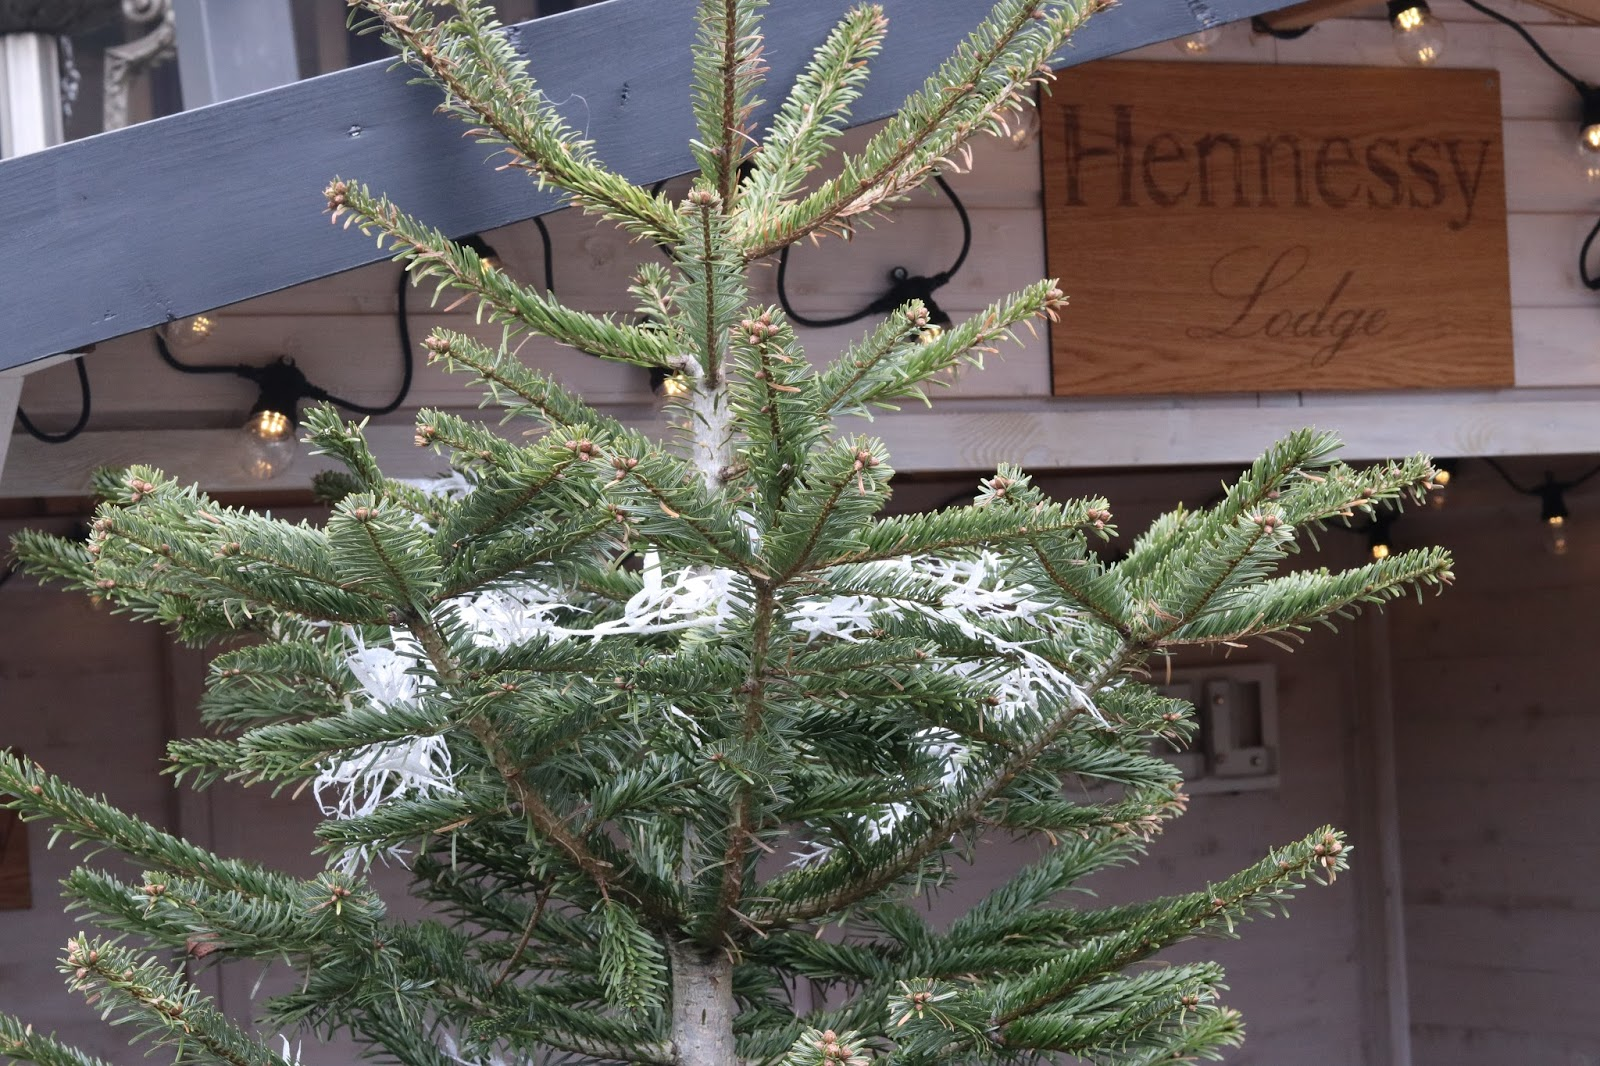 The Winter Garden, The Four Seasons Hotel, Park Lane, London